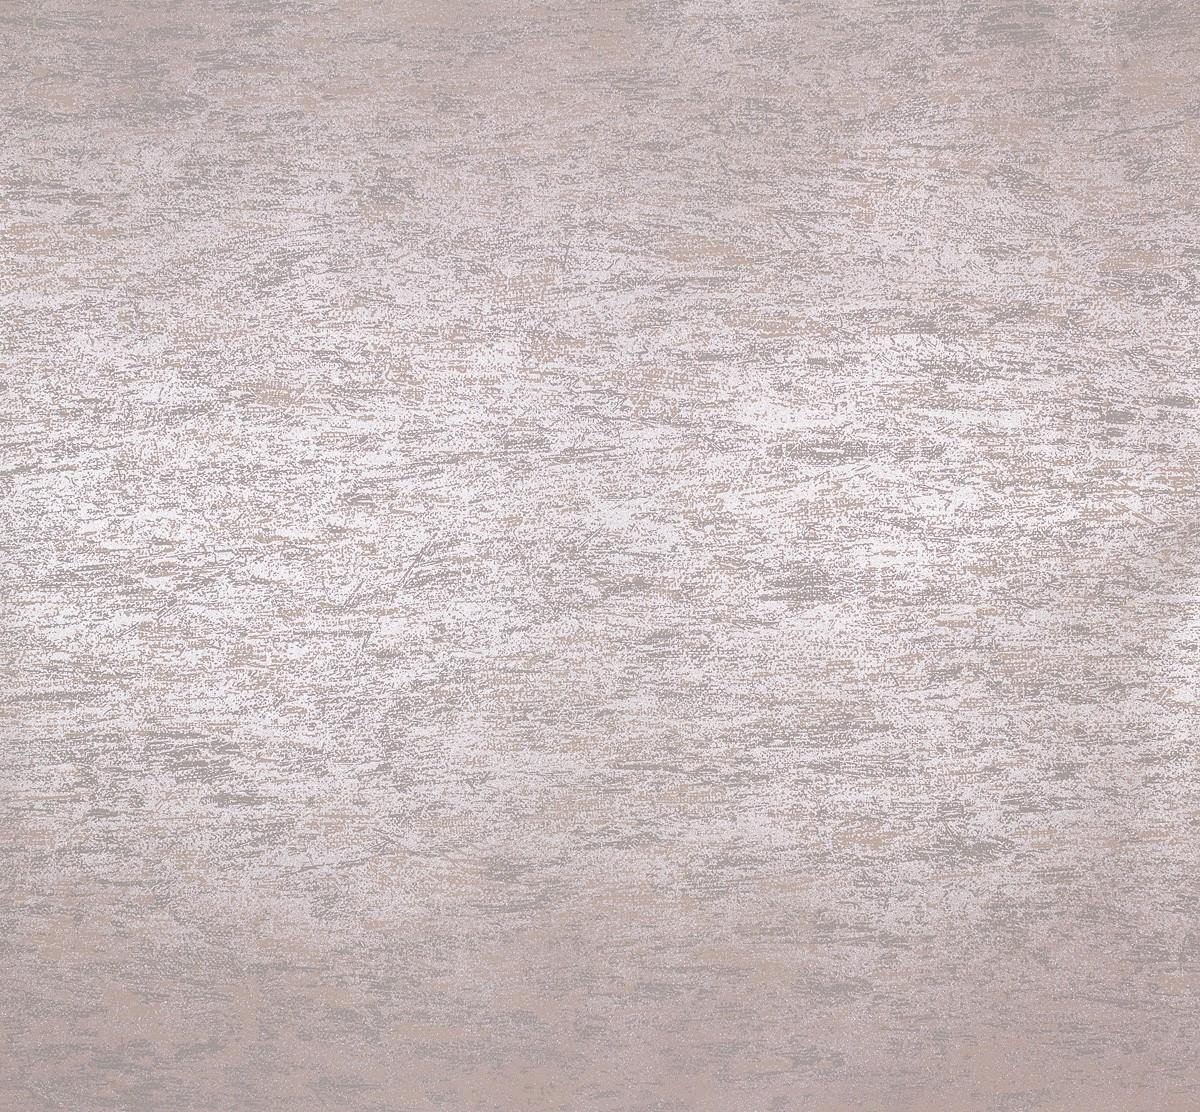 vliestapete rosa blau struktur estelle marburg 55737. Black Bedroom Furniture Sets. Home Design Ideas